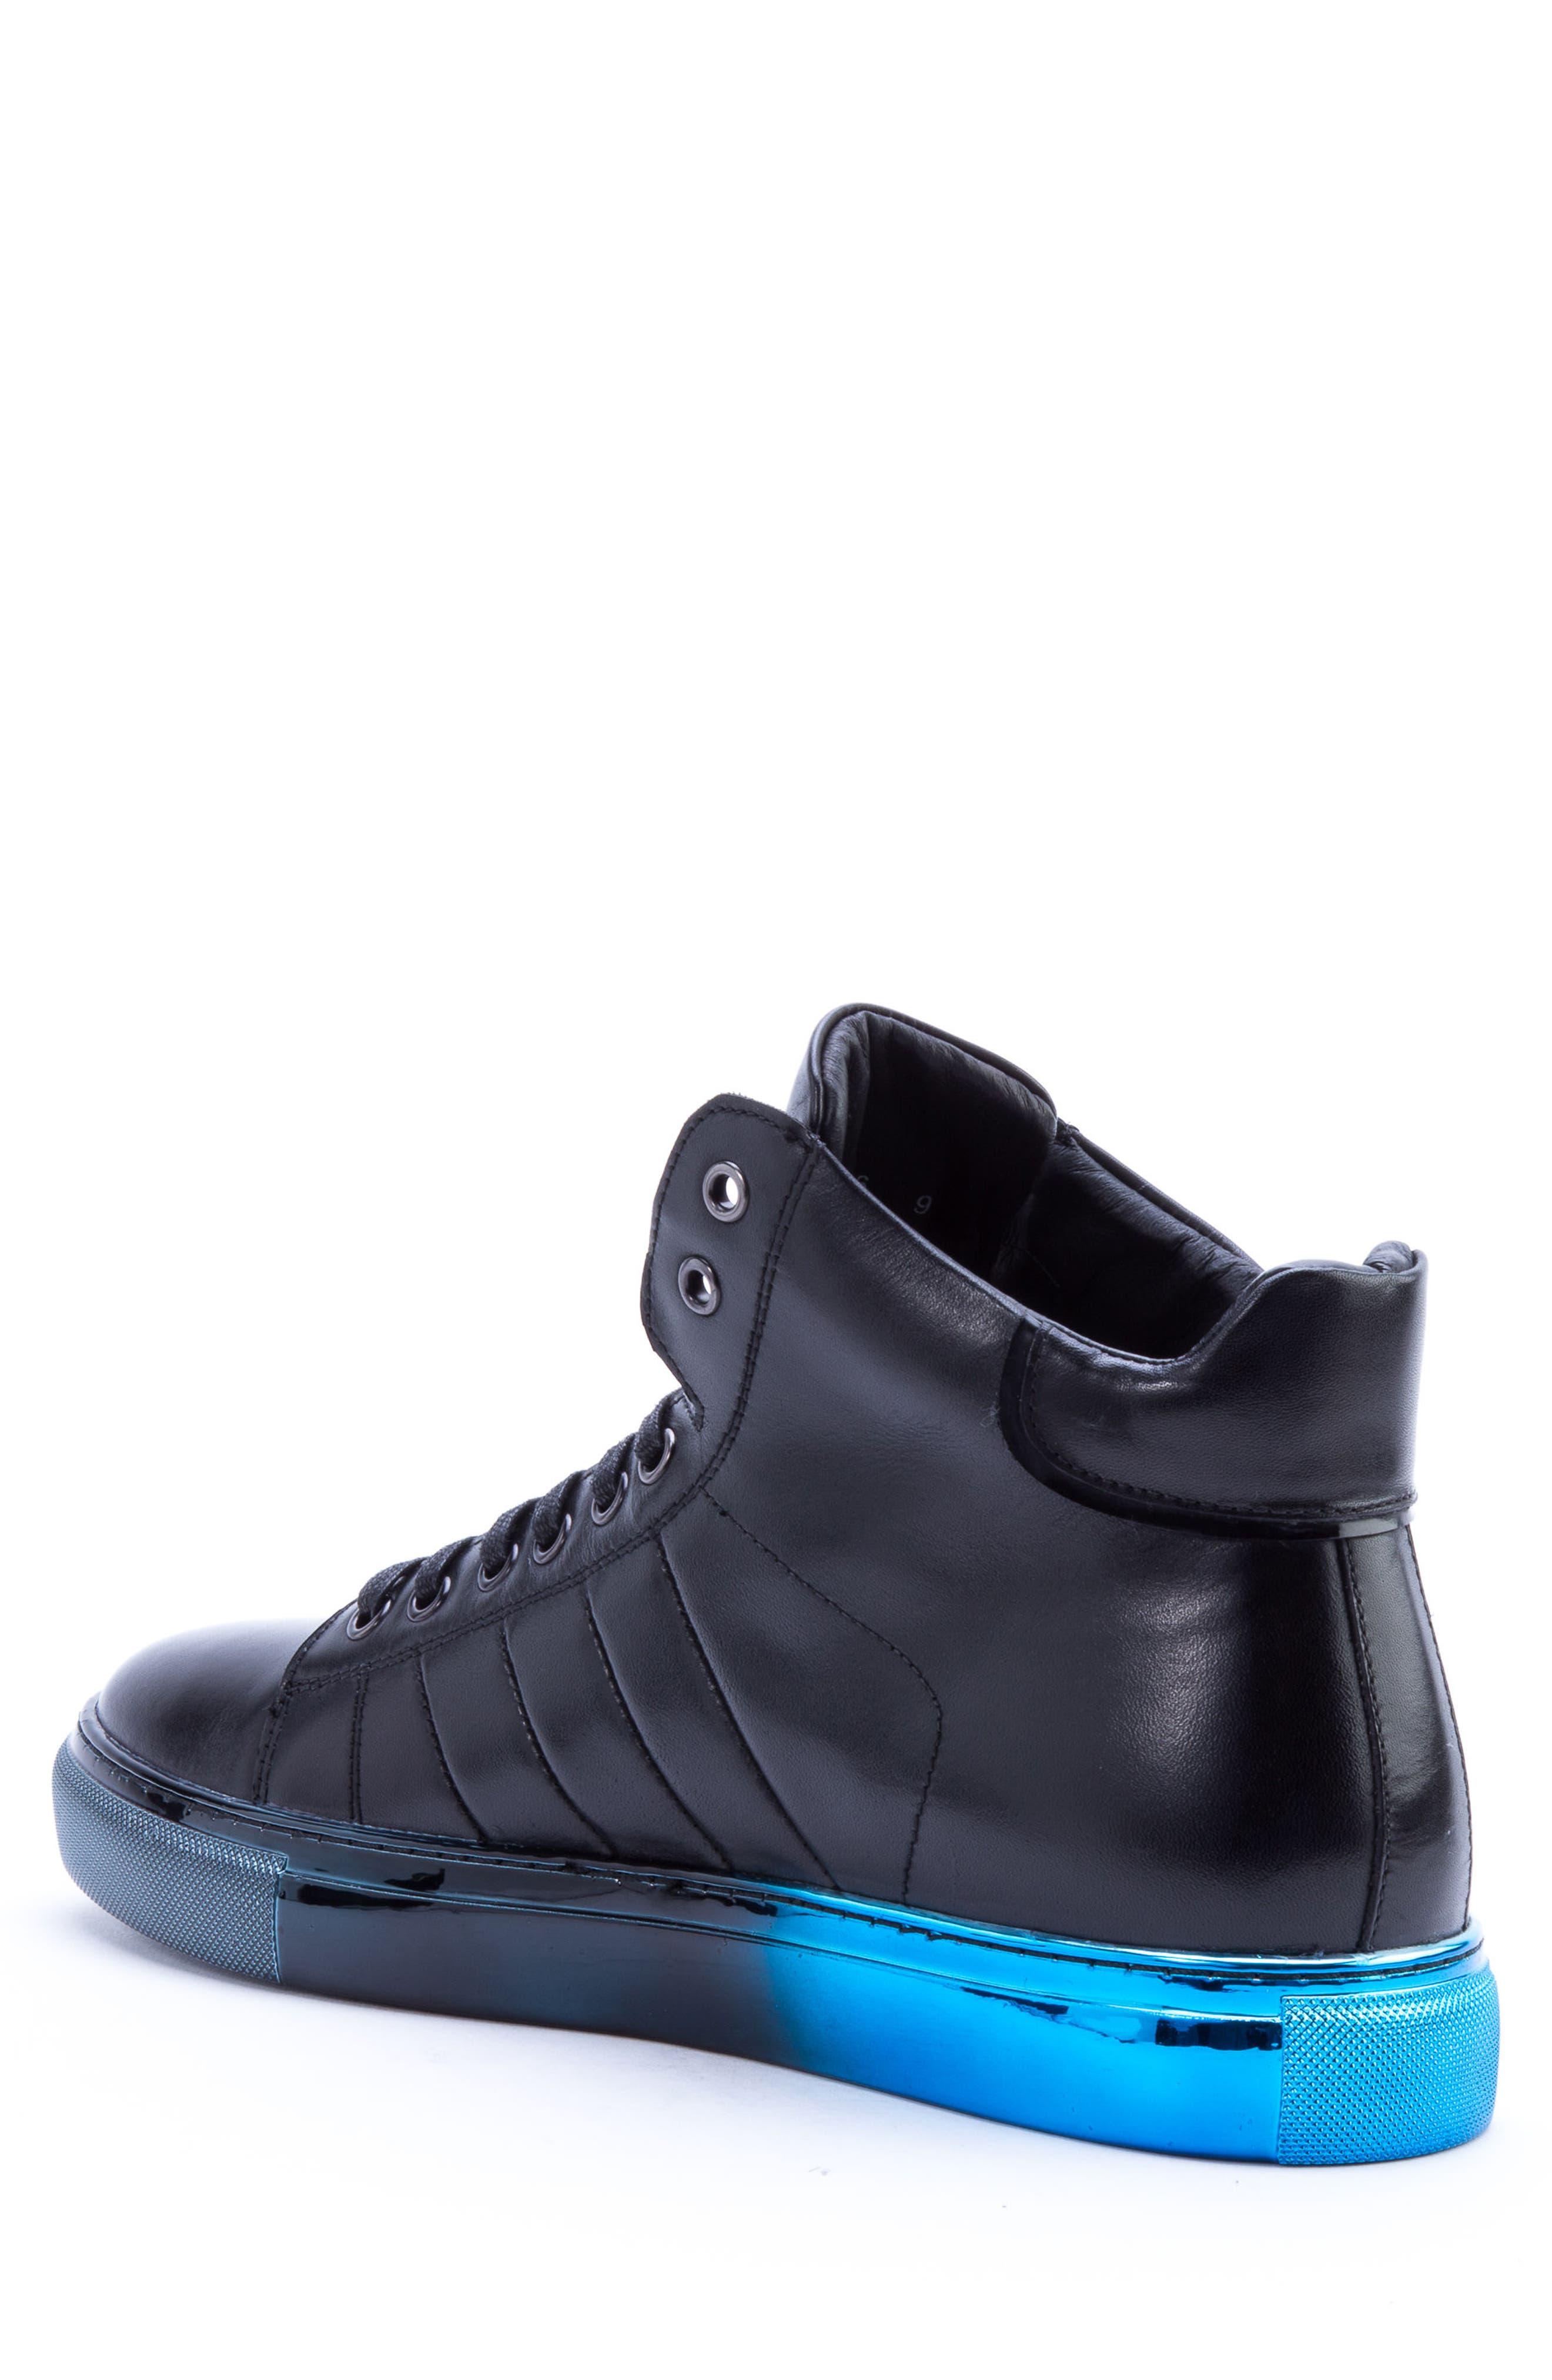 Badgley Mischka Hunter High Top Sneaker,                             Alternate thumbnail 2, color,                             NAVY LEATHER